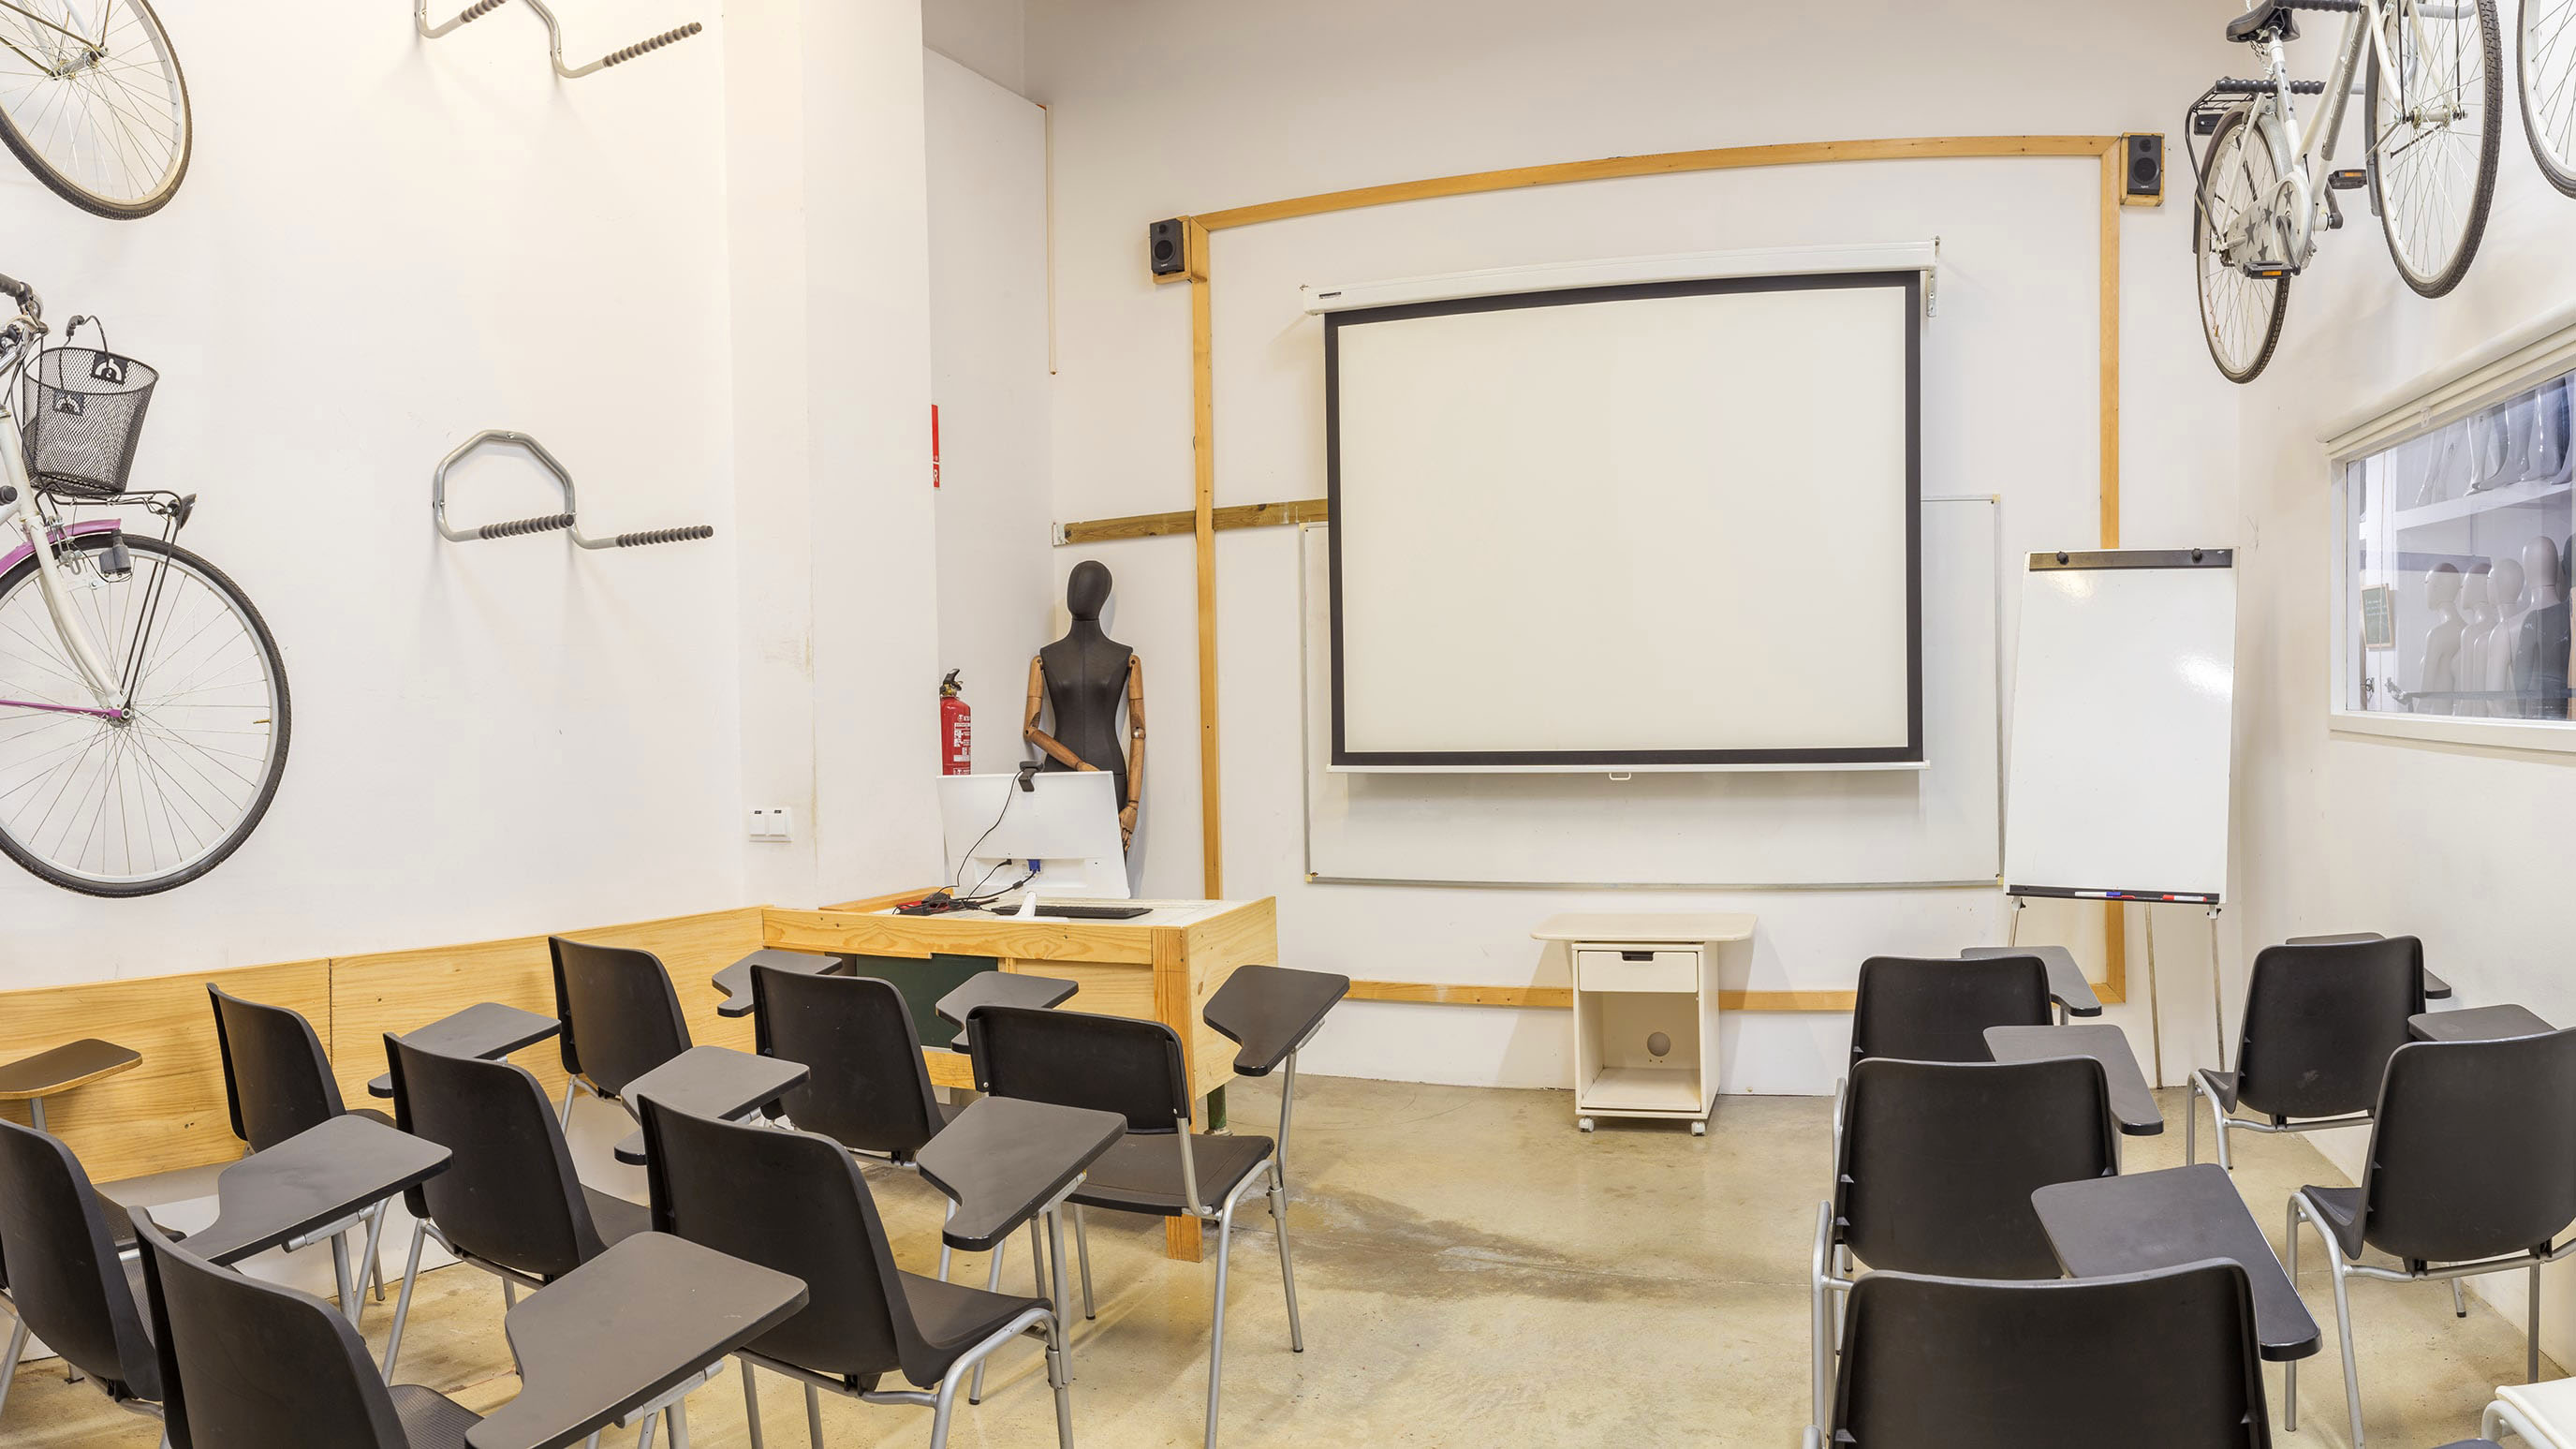 Aula teórica 2 para 35 asistentes